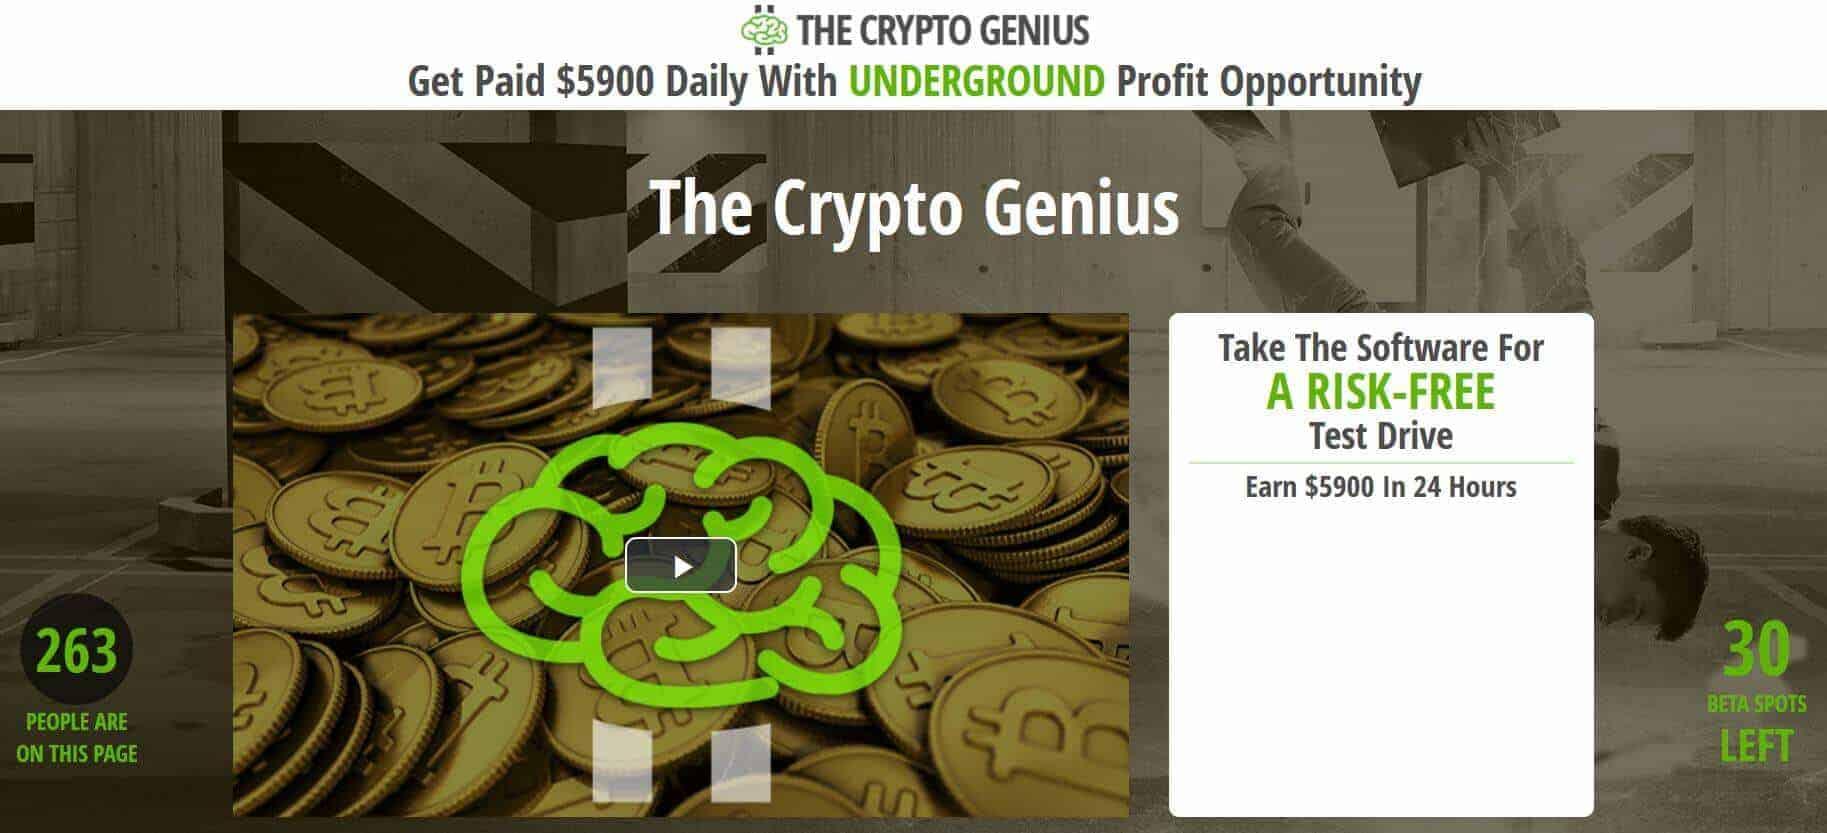 Homepage of Crypto Genius